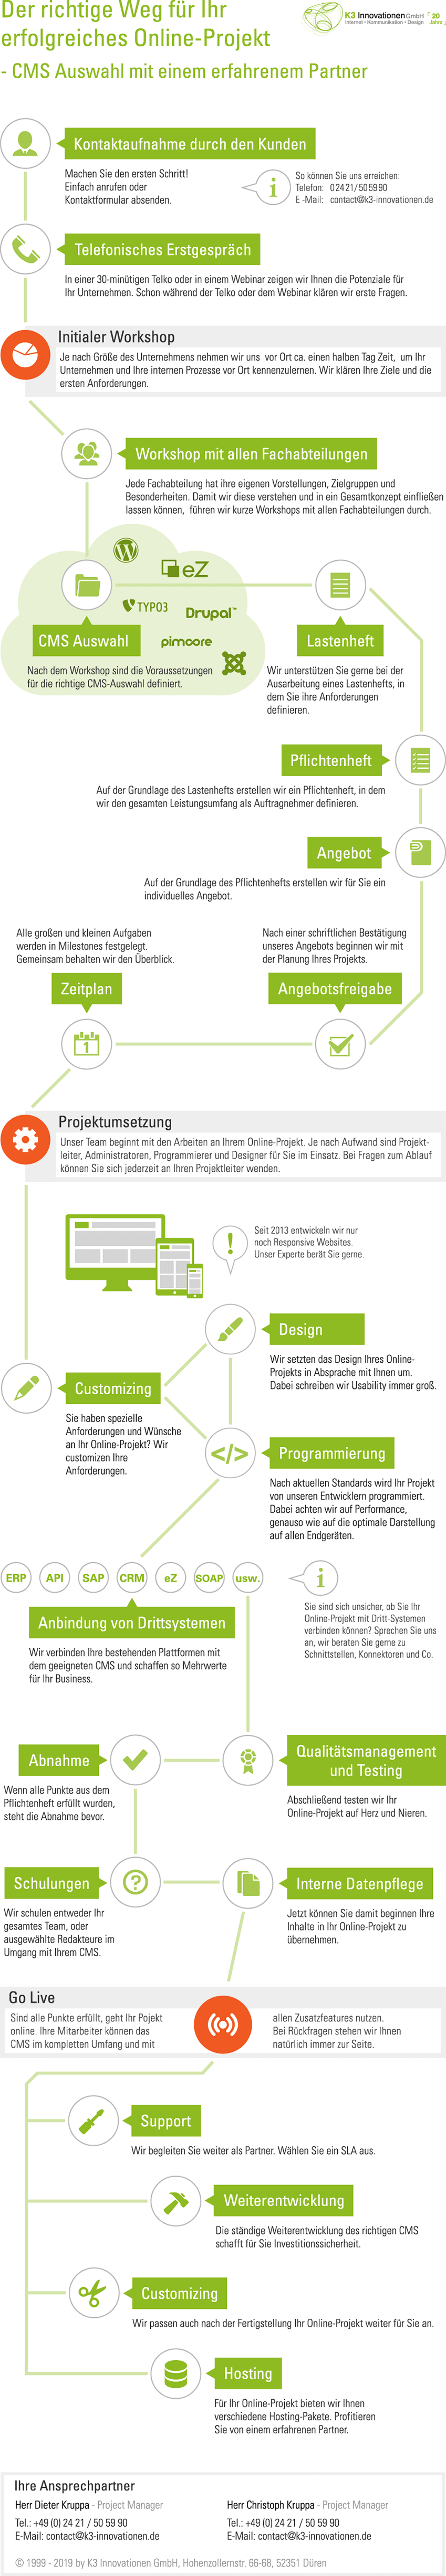 Projektablauf CMS Webprojekte 2019